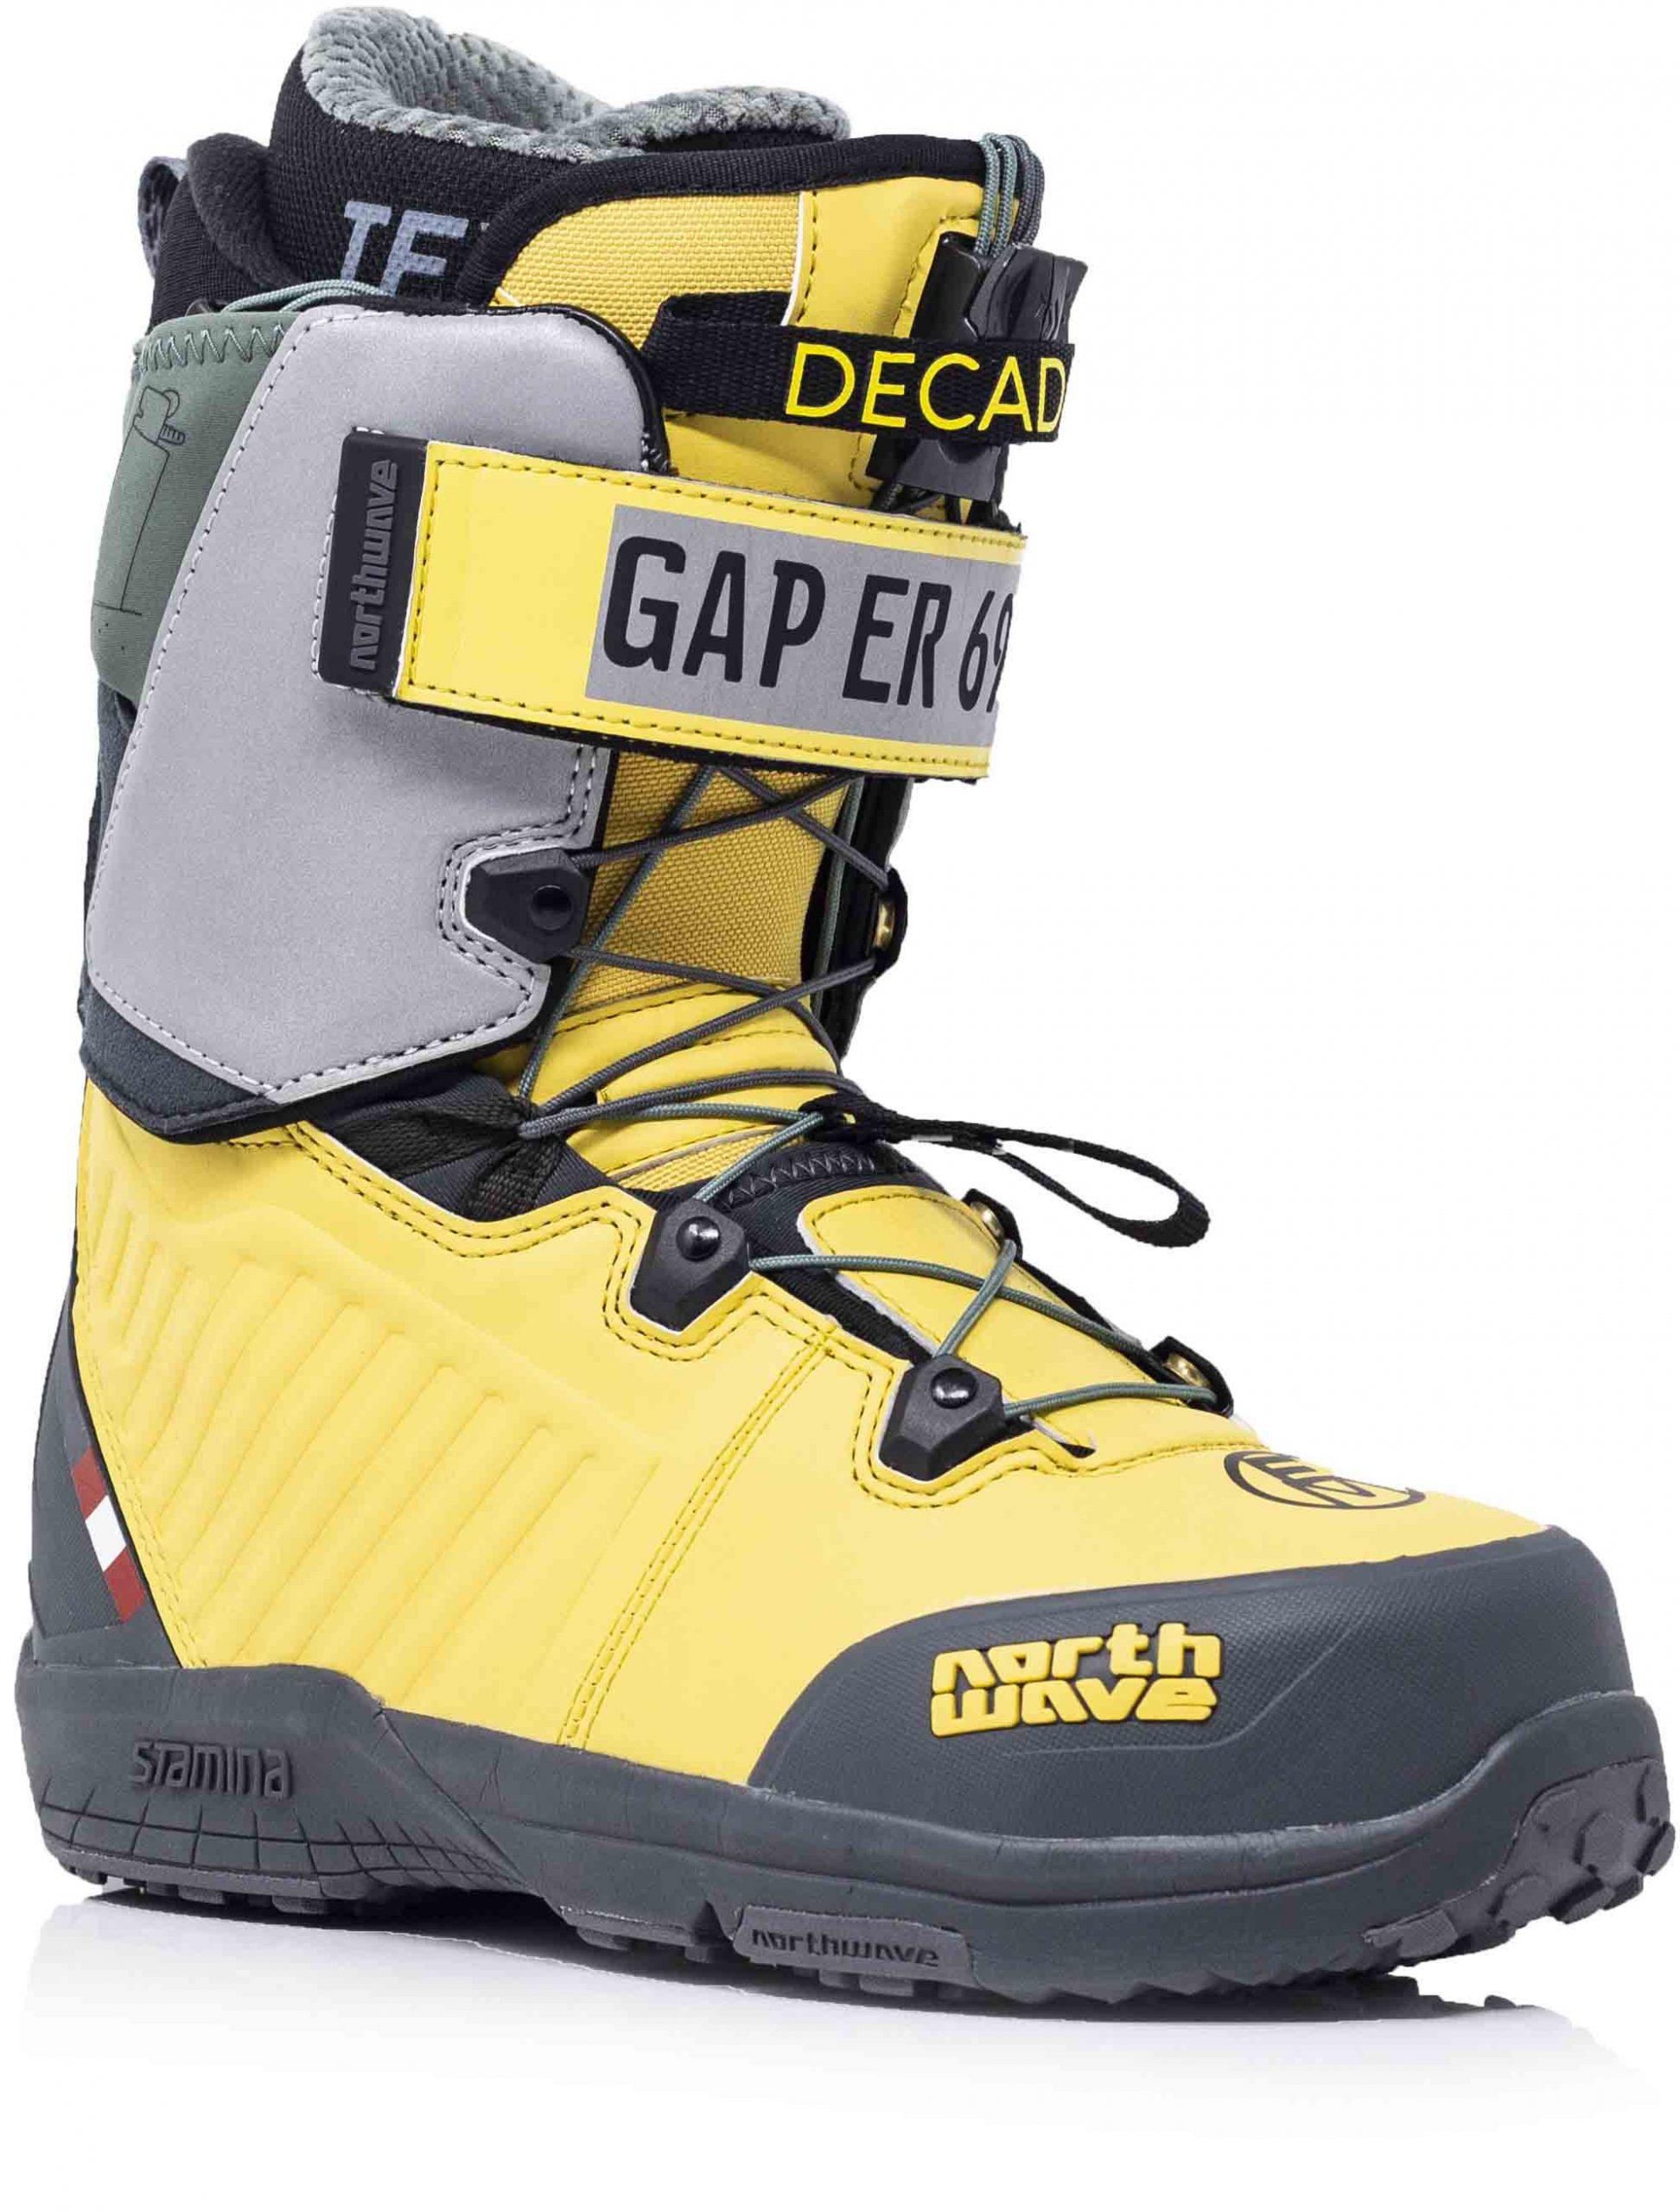 Northwave 21/22 Snowboard Boots